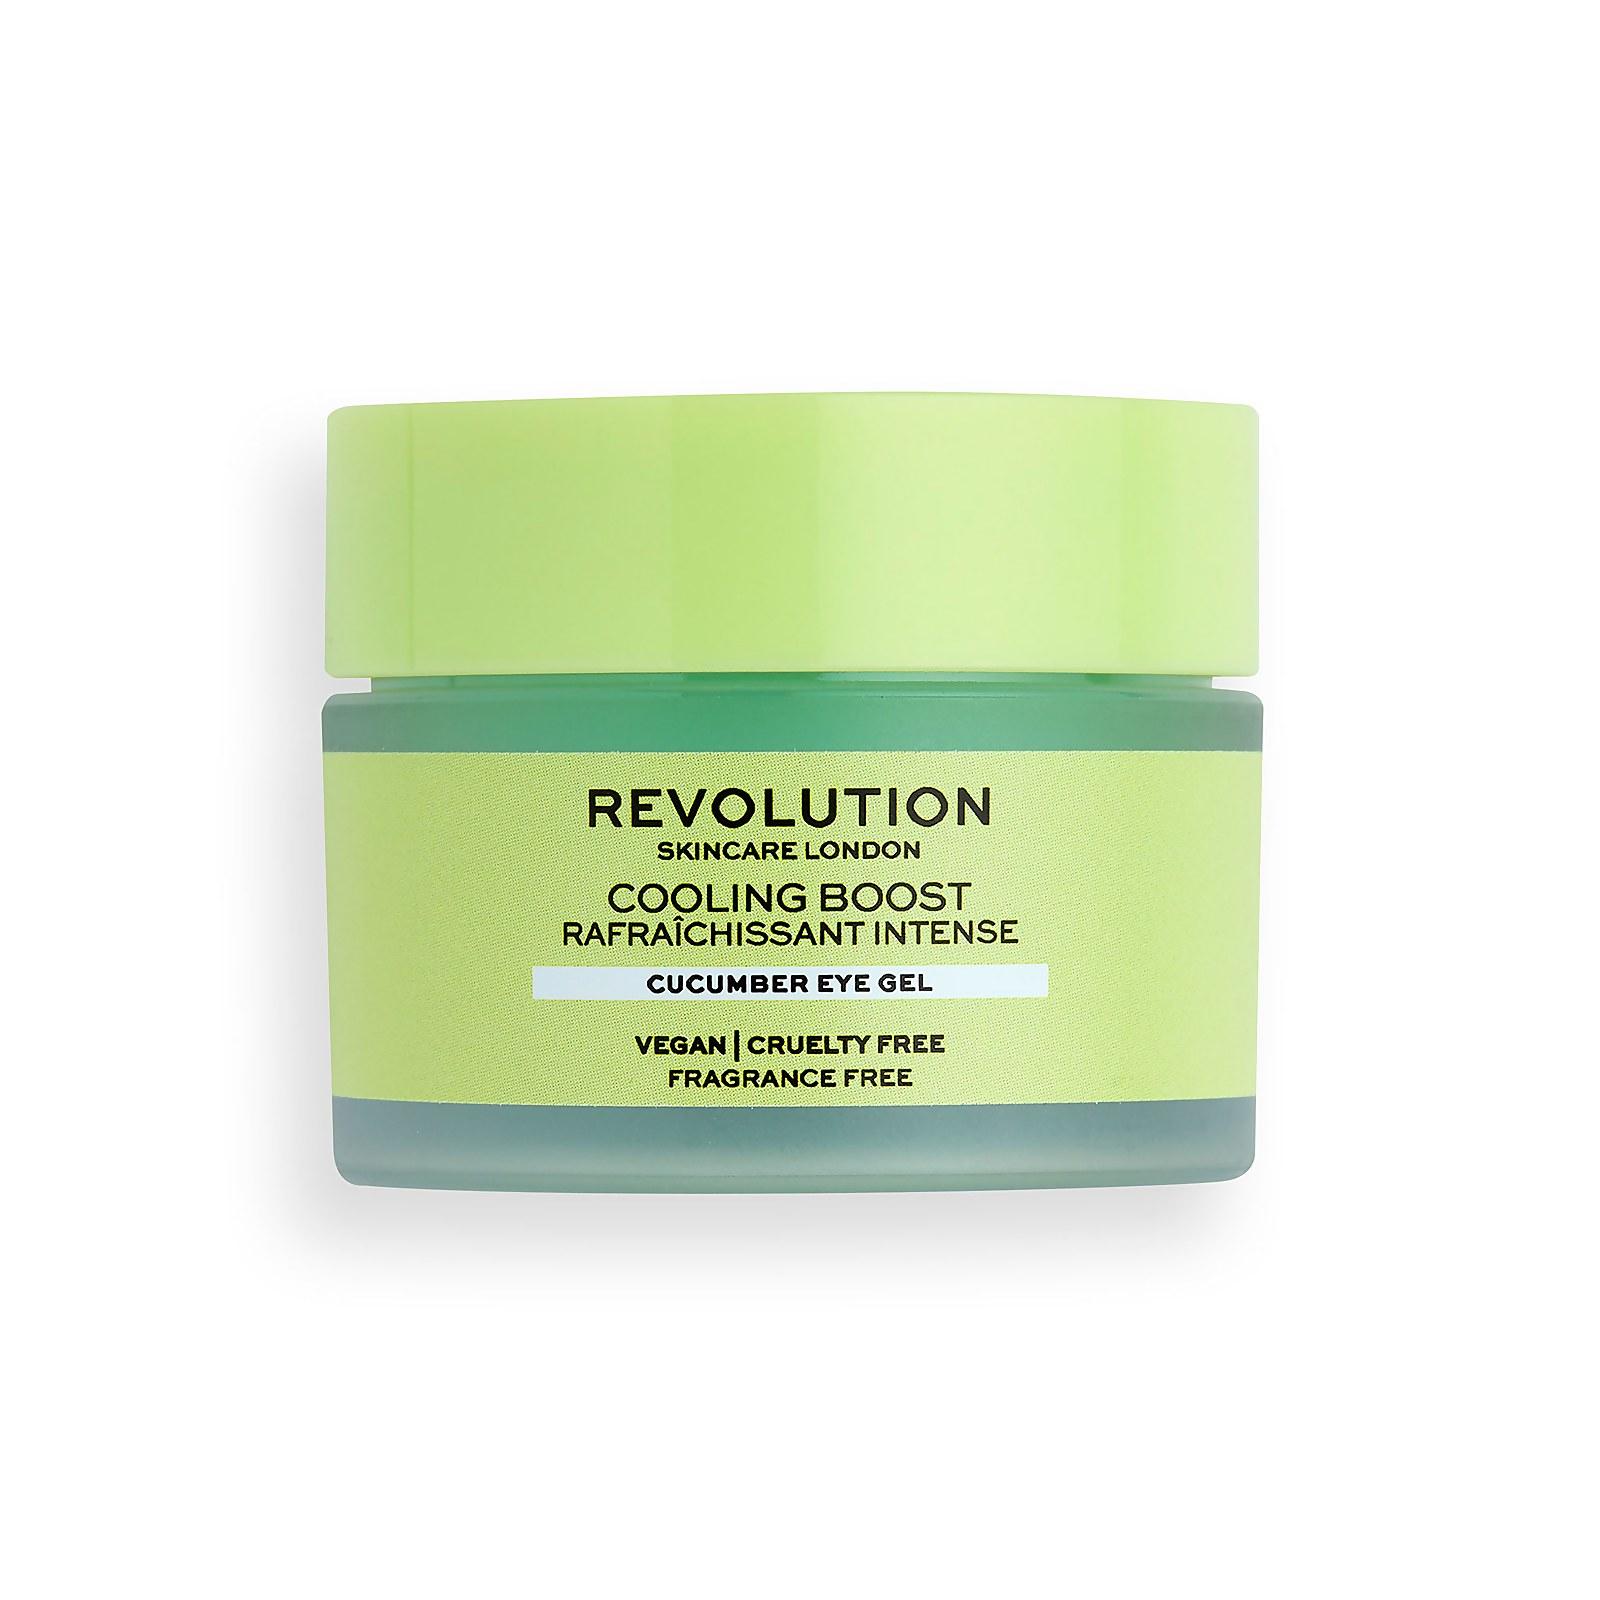 Купить Revolution Skincare Cooling Boost Cucumber Eye Gel 15ml